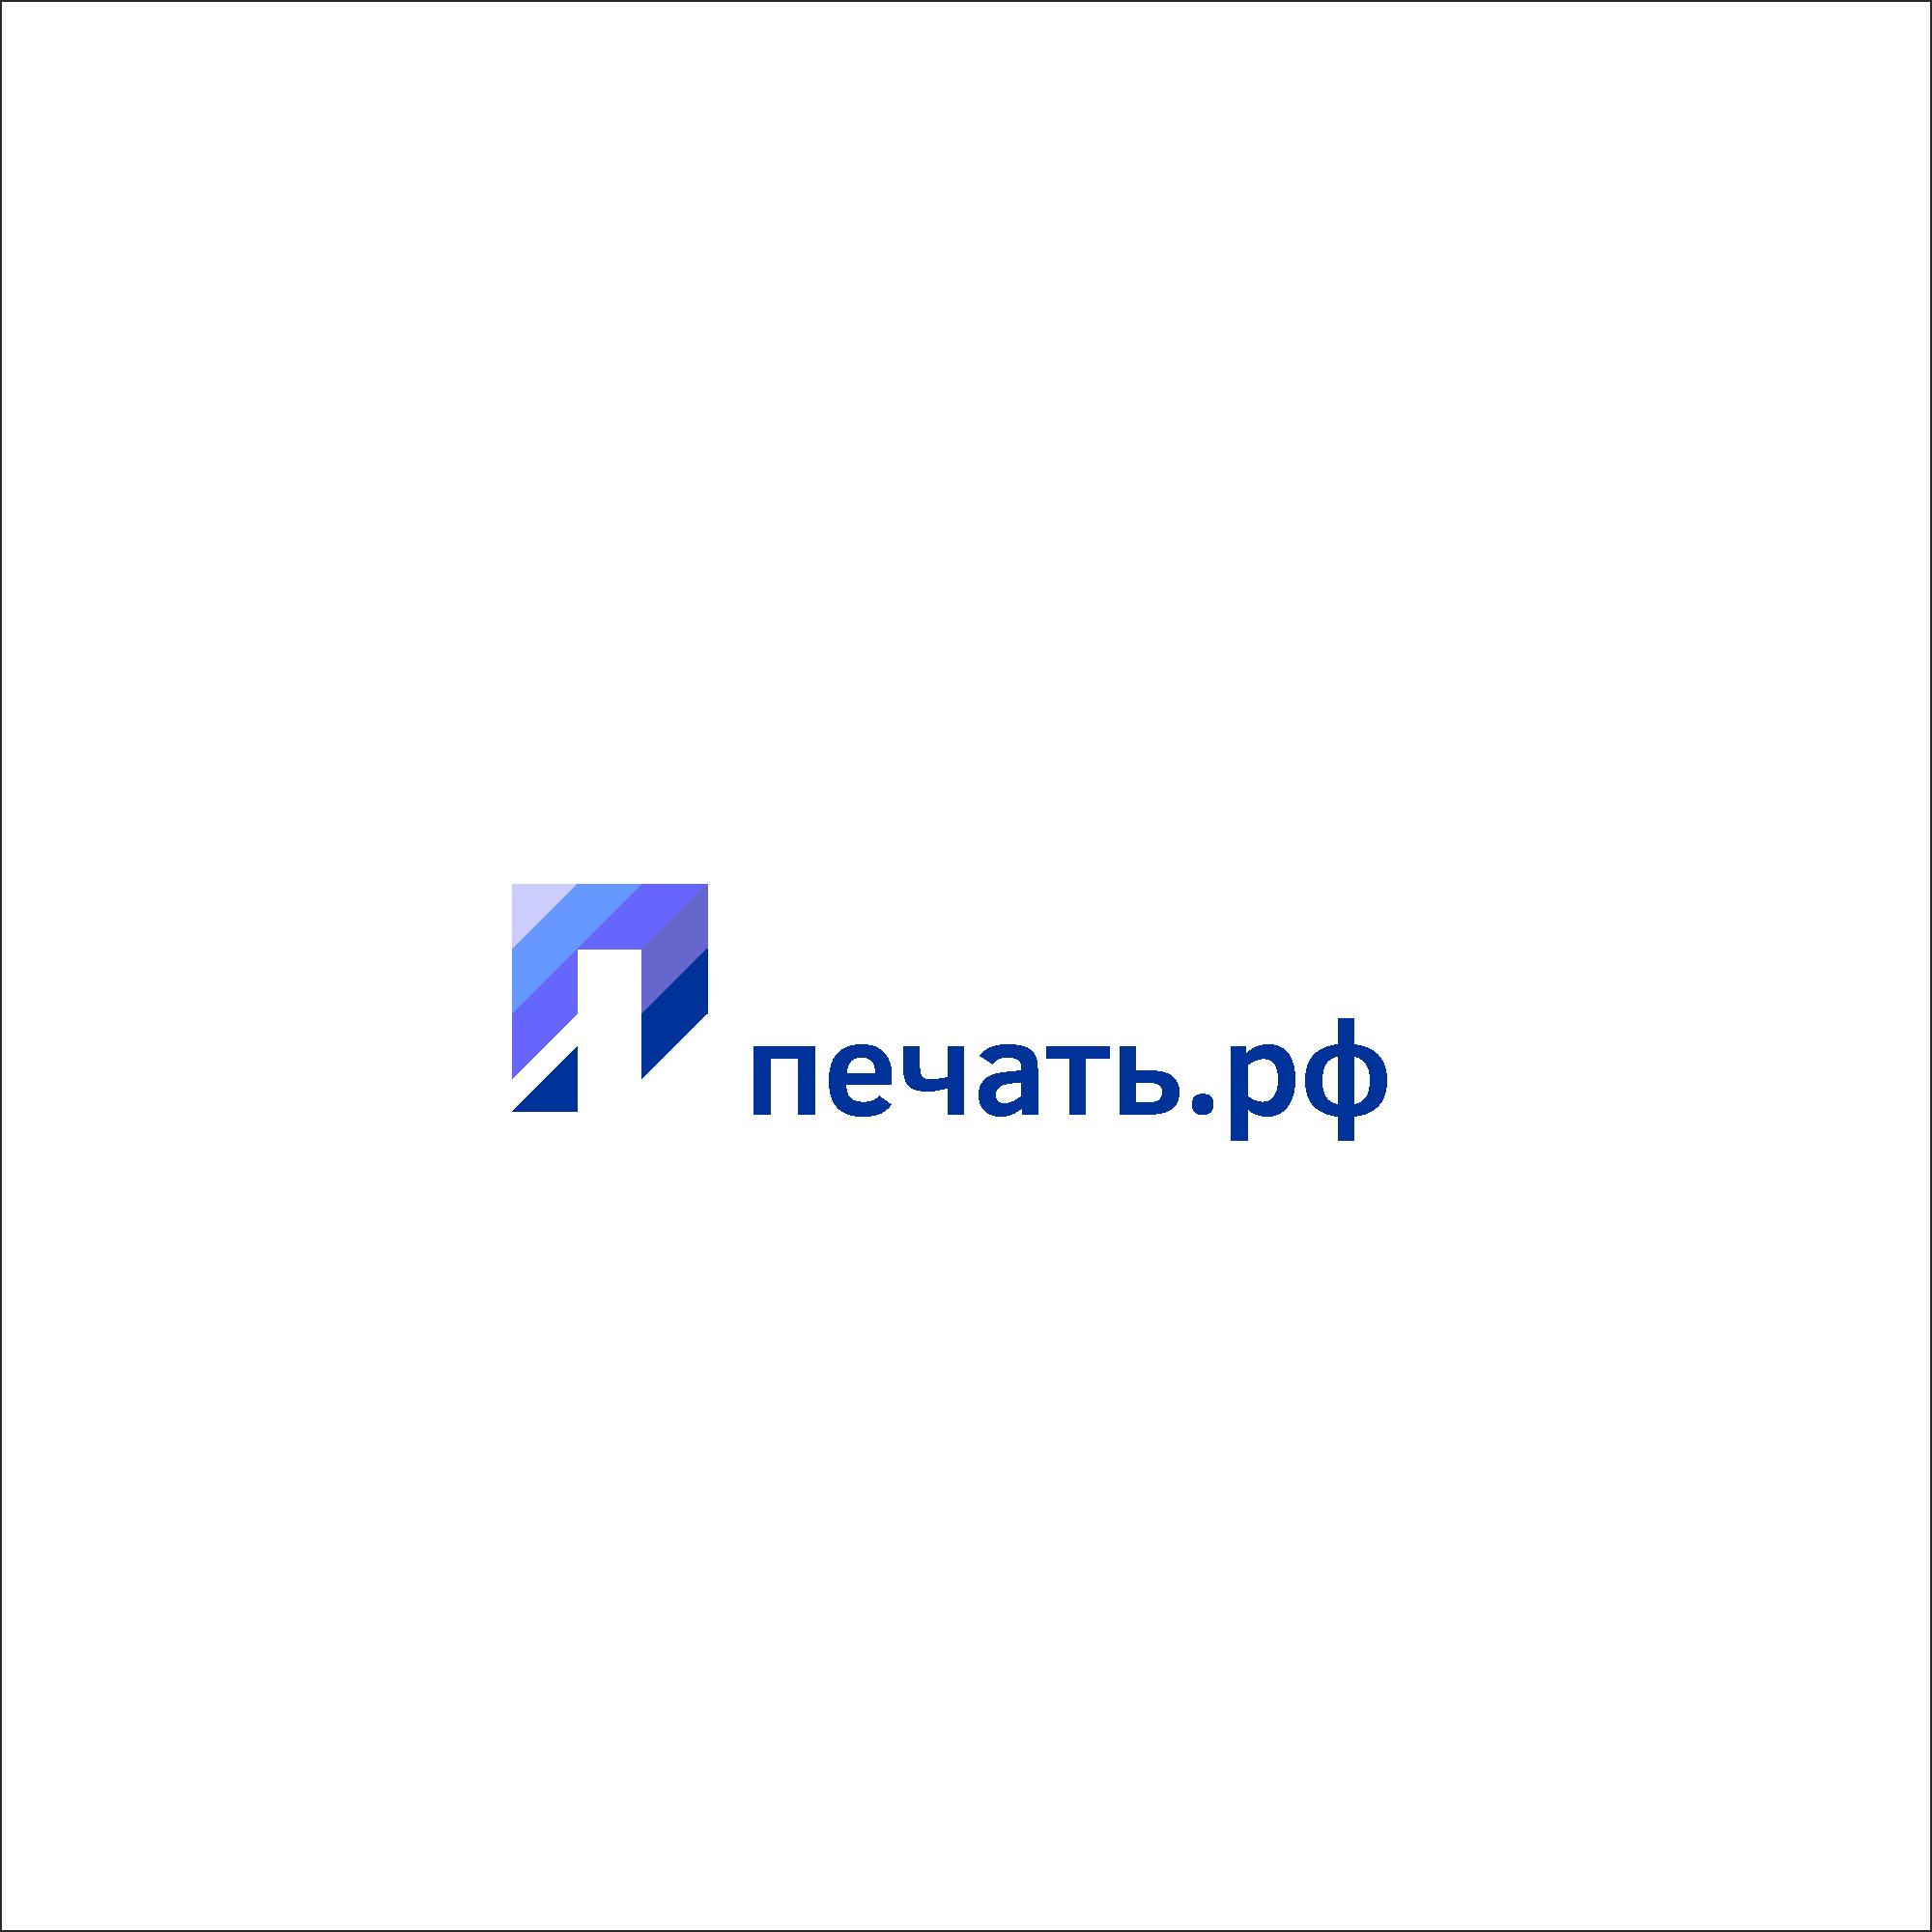 Логотип для веб-сервиса интерьерной печати и оперативной пол фото f_4155d29e056d3bb9.png